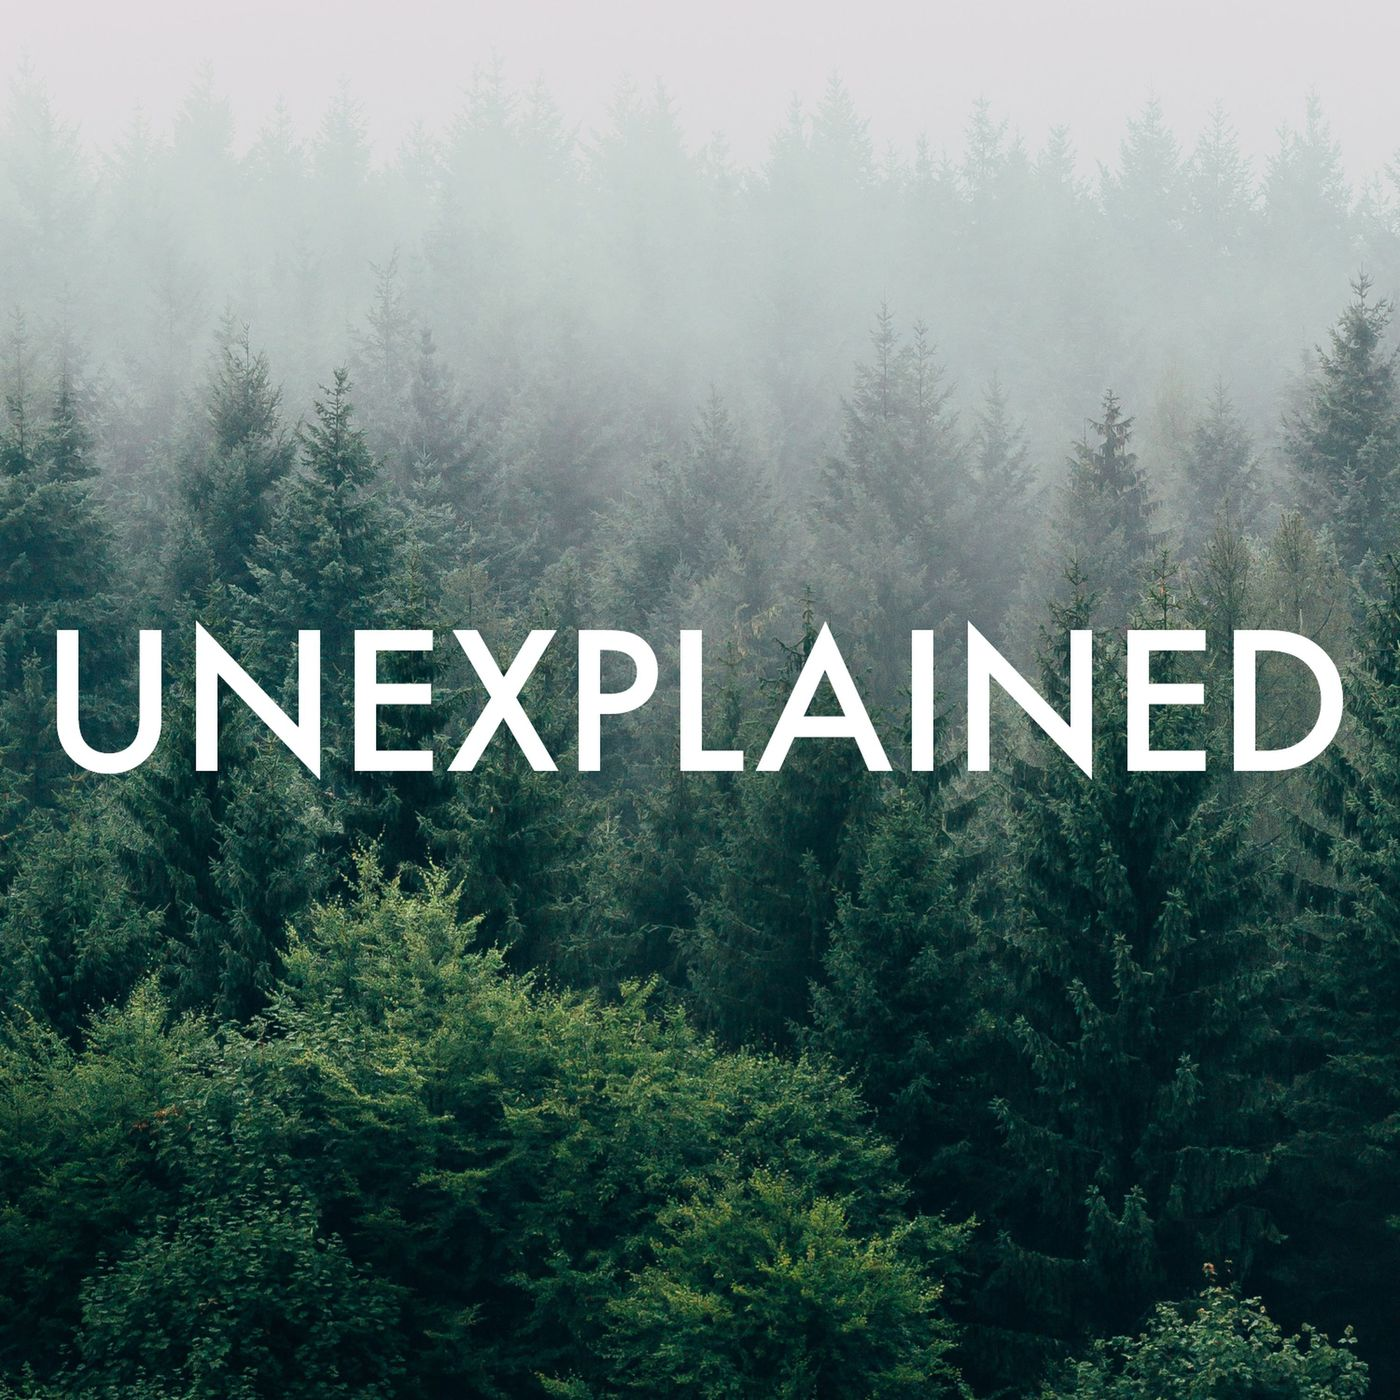 Halloween Special 2018 - Unexplained Audiobook Extract